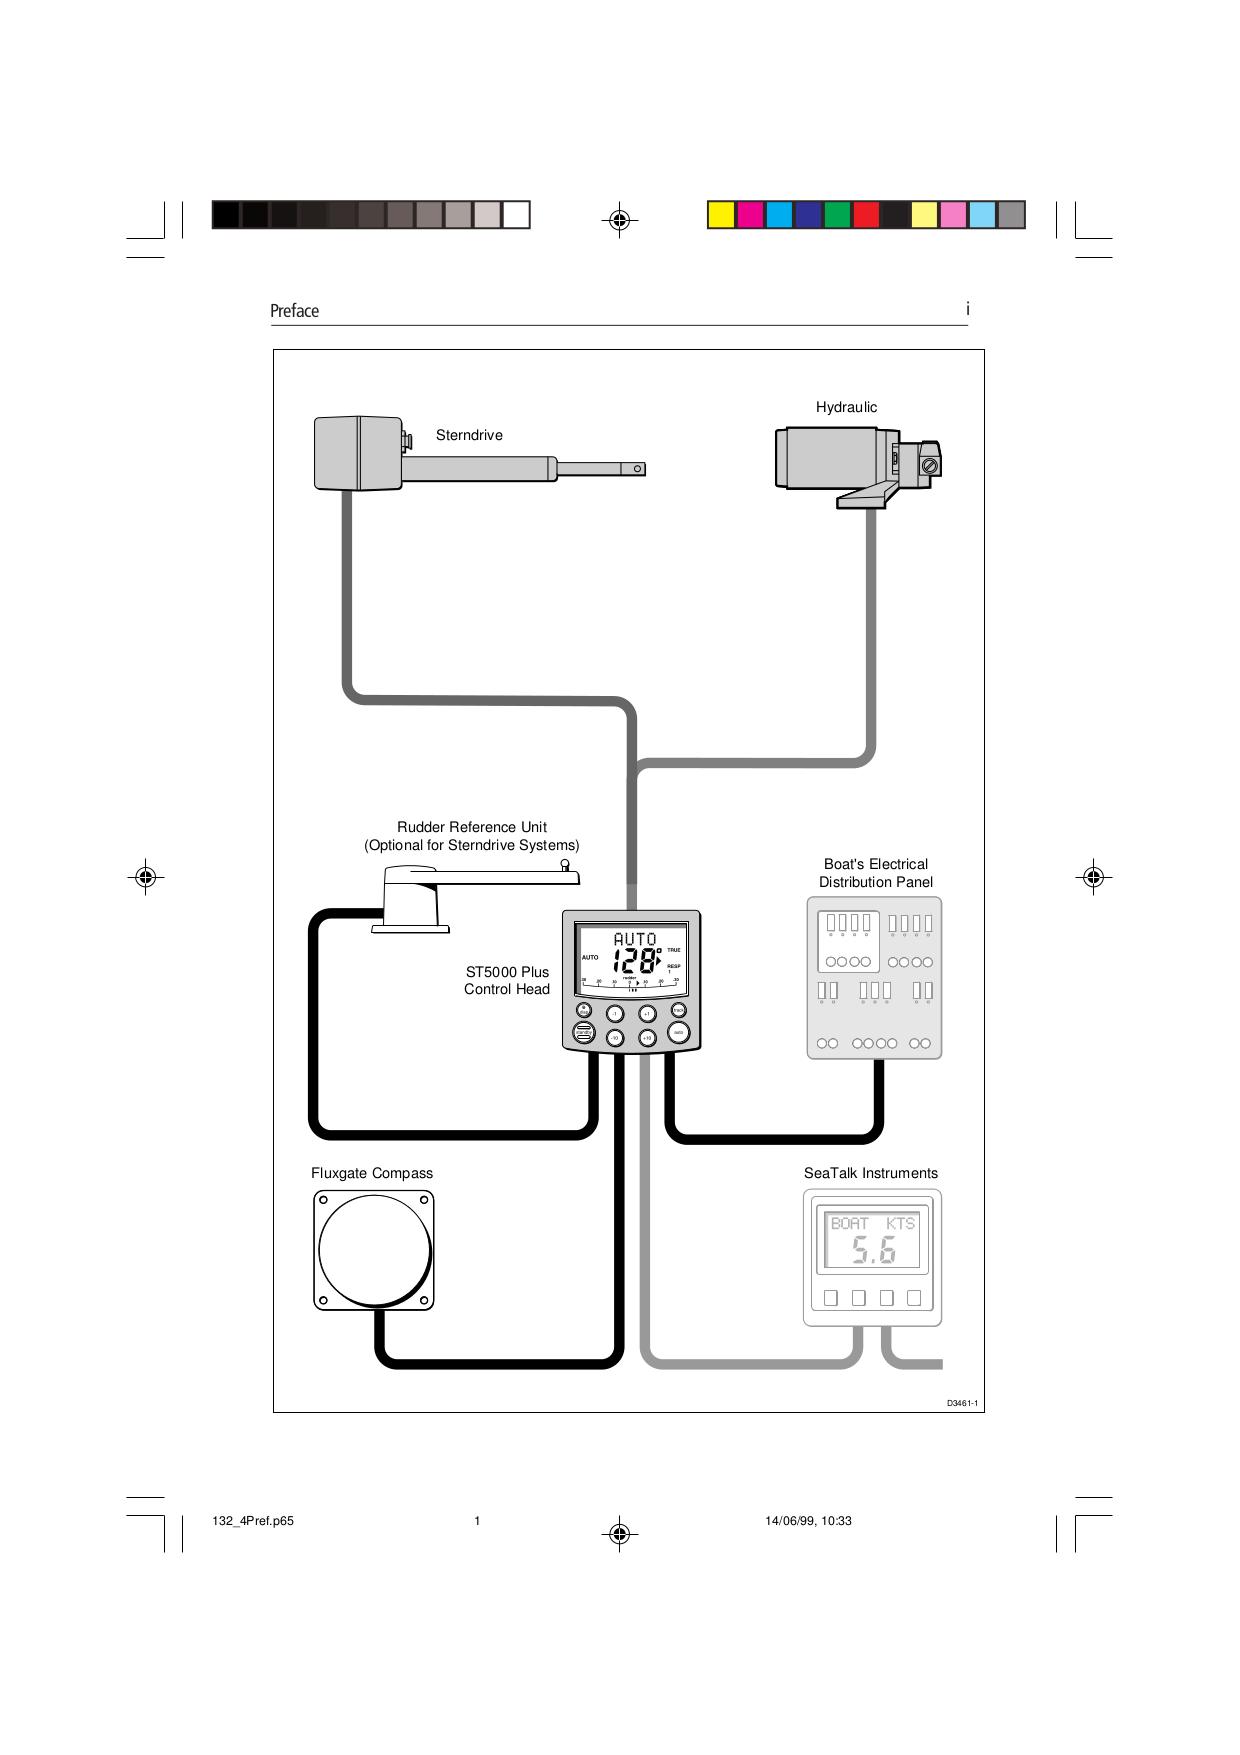 pdf manual for raymarine gps autohelm st5000 rh umlib com ST60 Raymarine Autohelm raymarine autopilot st5000+ manual